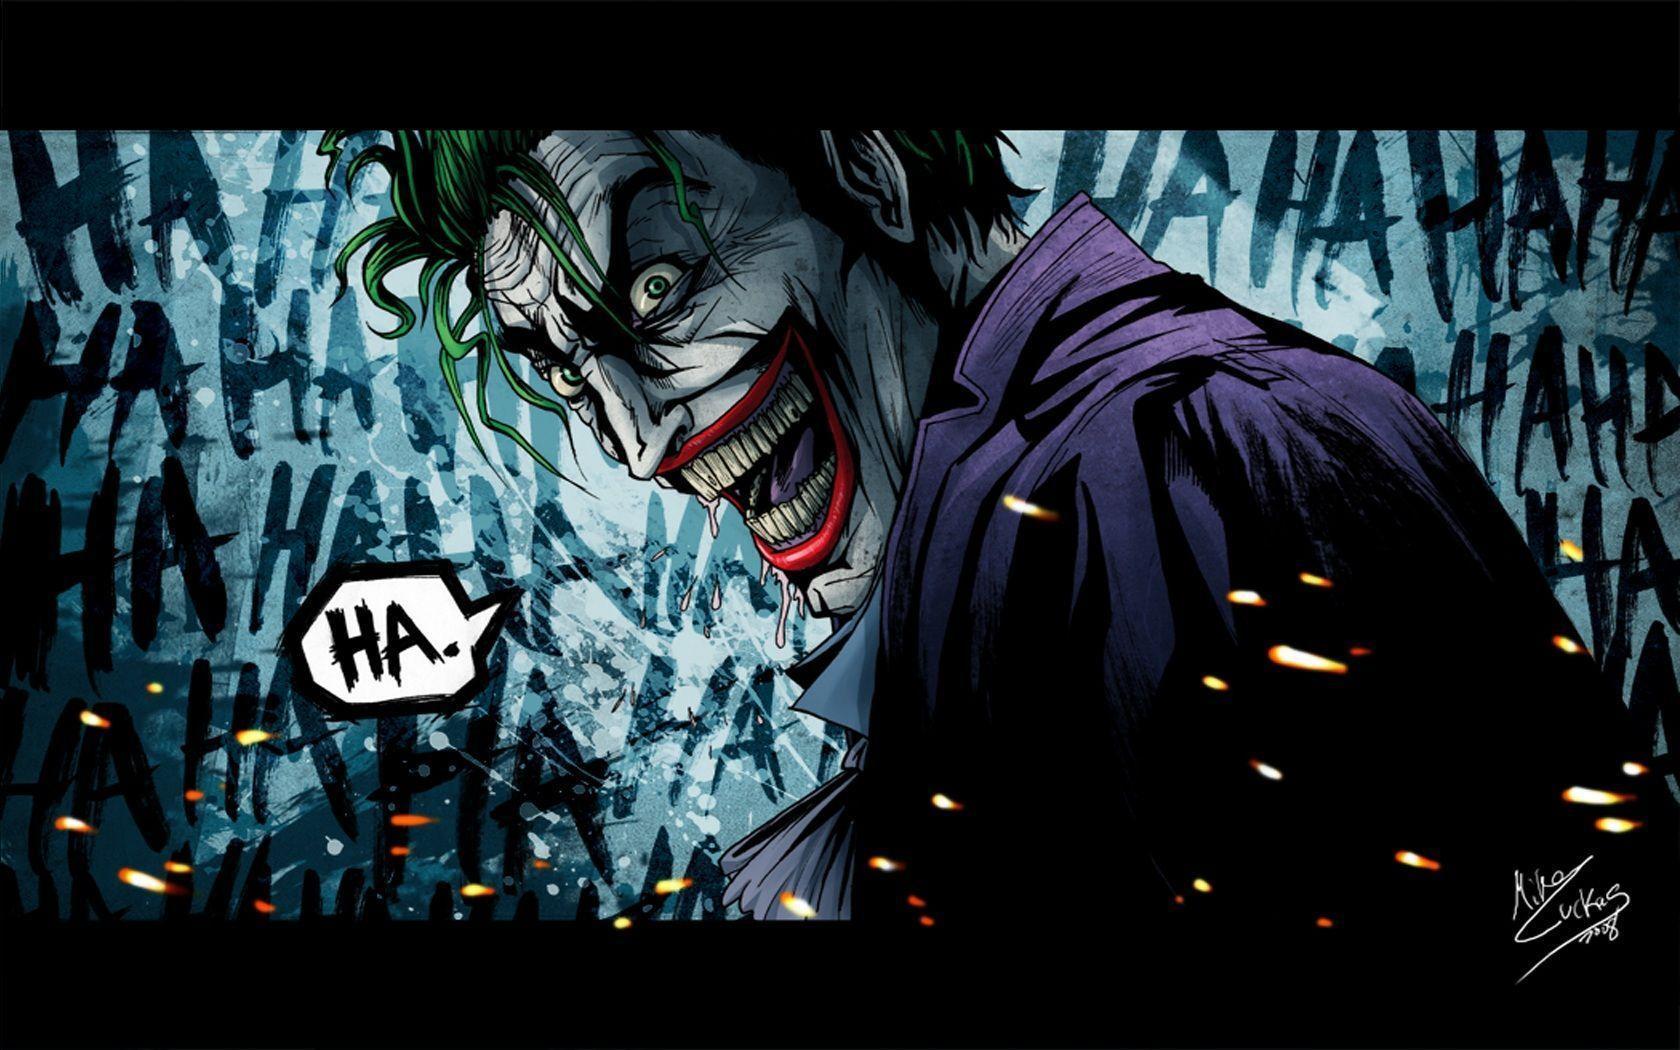 Joker comic wallpapers wallpaper cave the joker cartoon wallpaper hd images pictures becuo voltagebd Choice Image